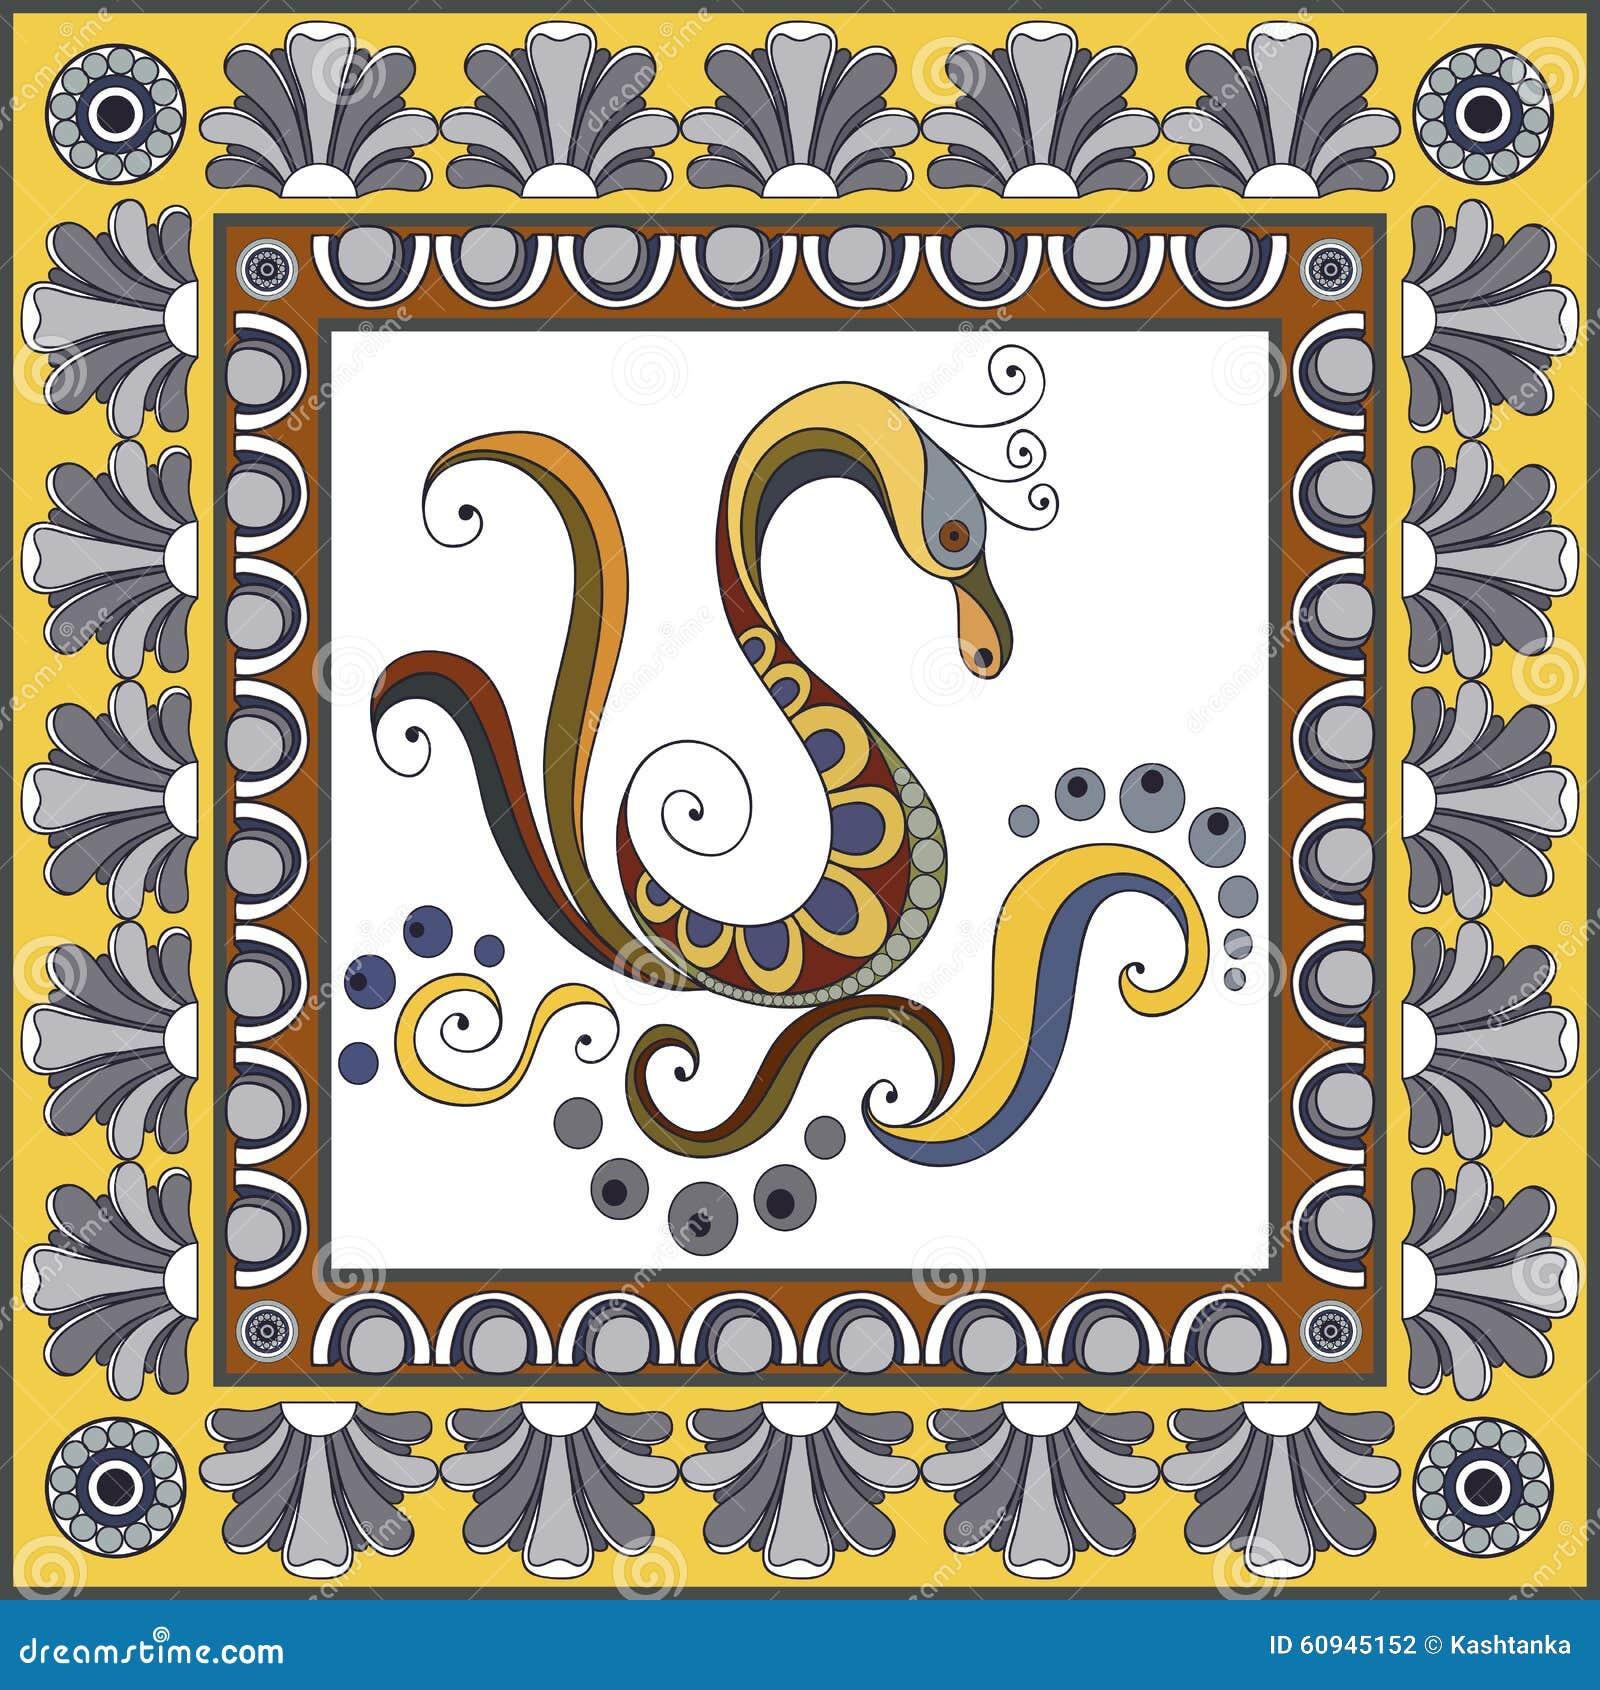 Portuguese pattern 2 stock vector. Illustration of ceramic ...